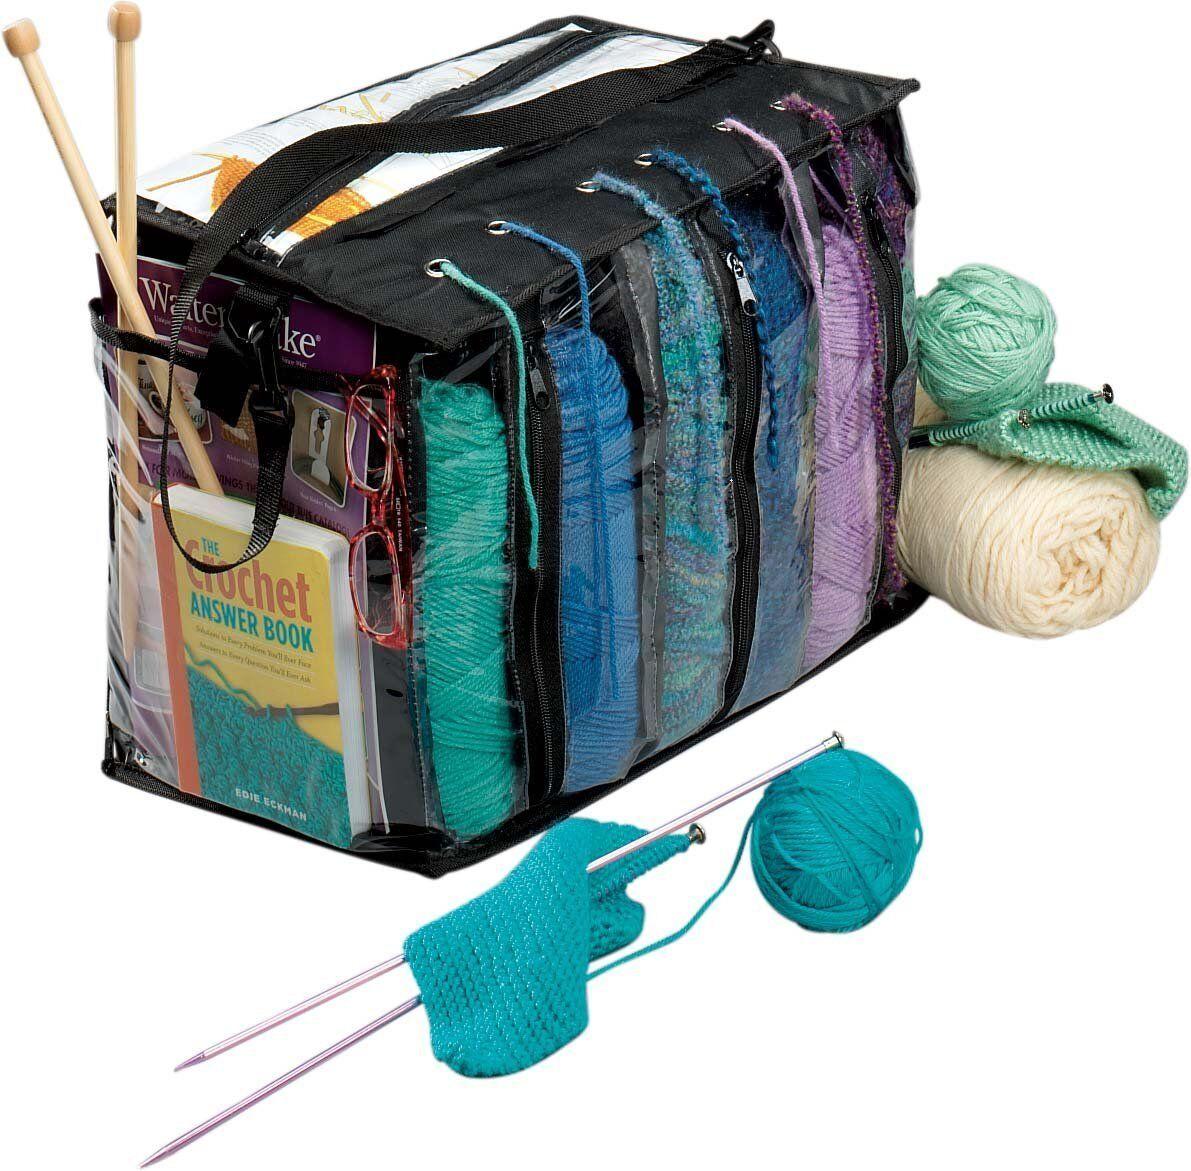 Knitting Handbag Tote Bag Yarn Storage Organizer Holder For Sewing Crochet Tool